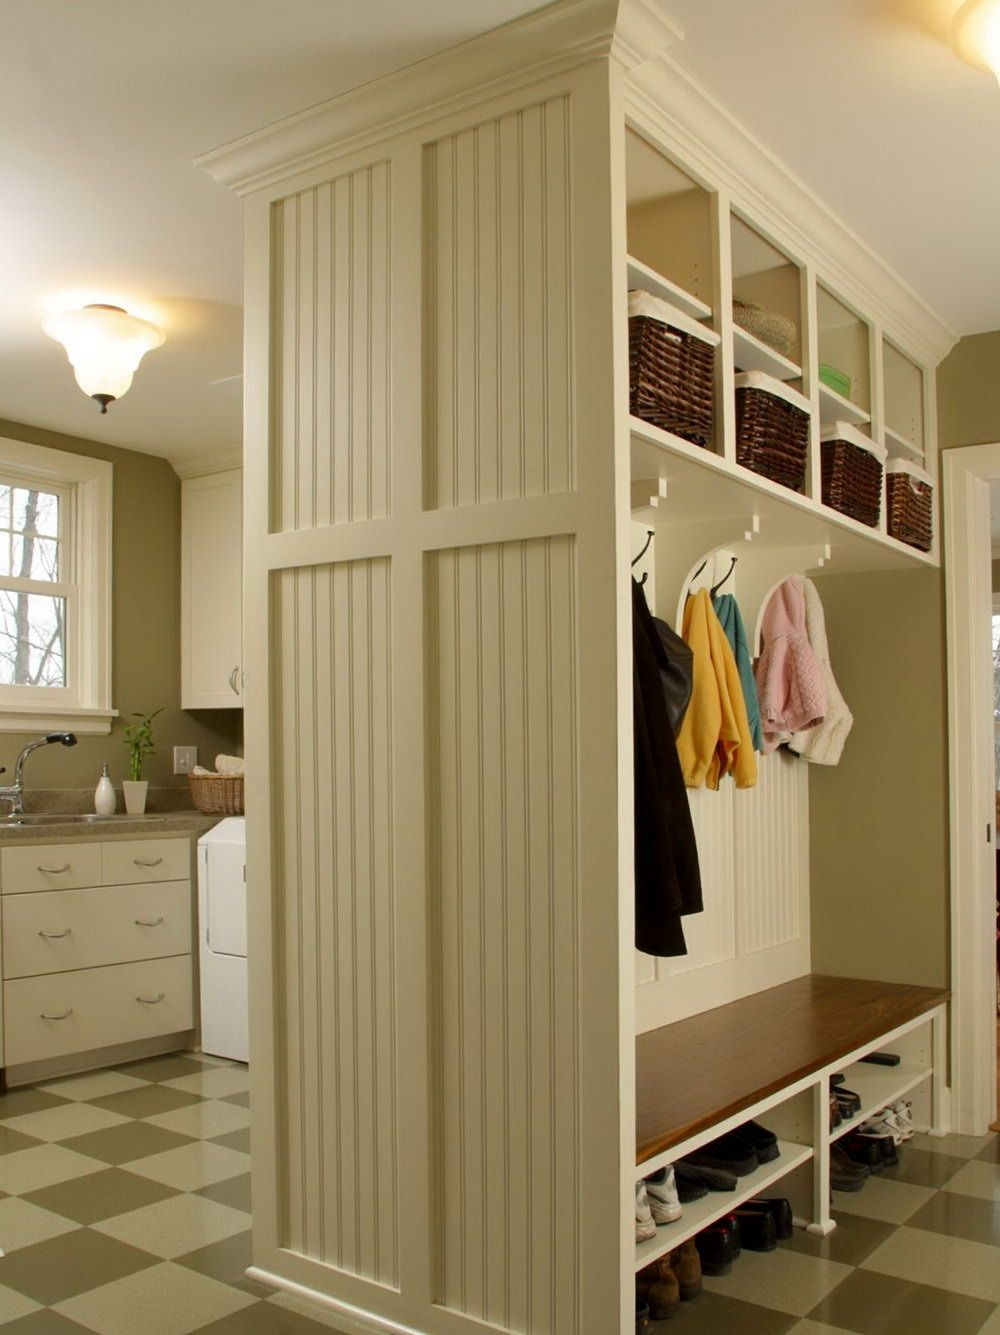 Lovely Laundry Room Bench Ideas Part - 14: Laundry Room Bench Ideas